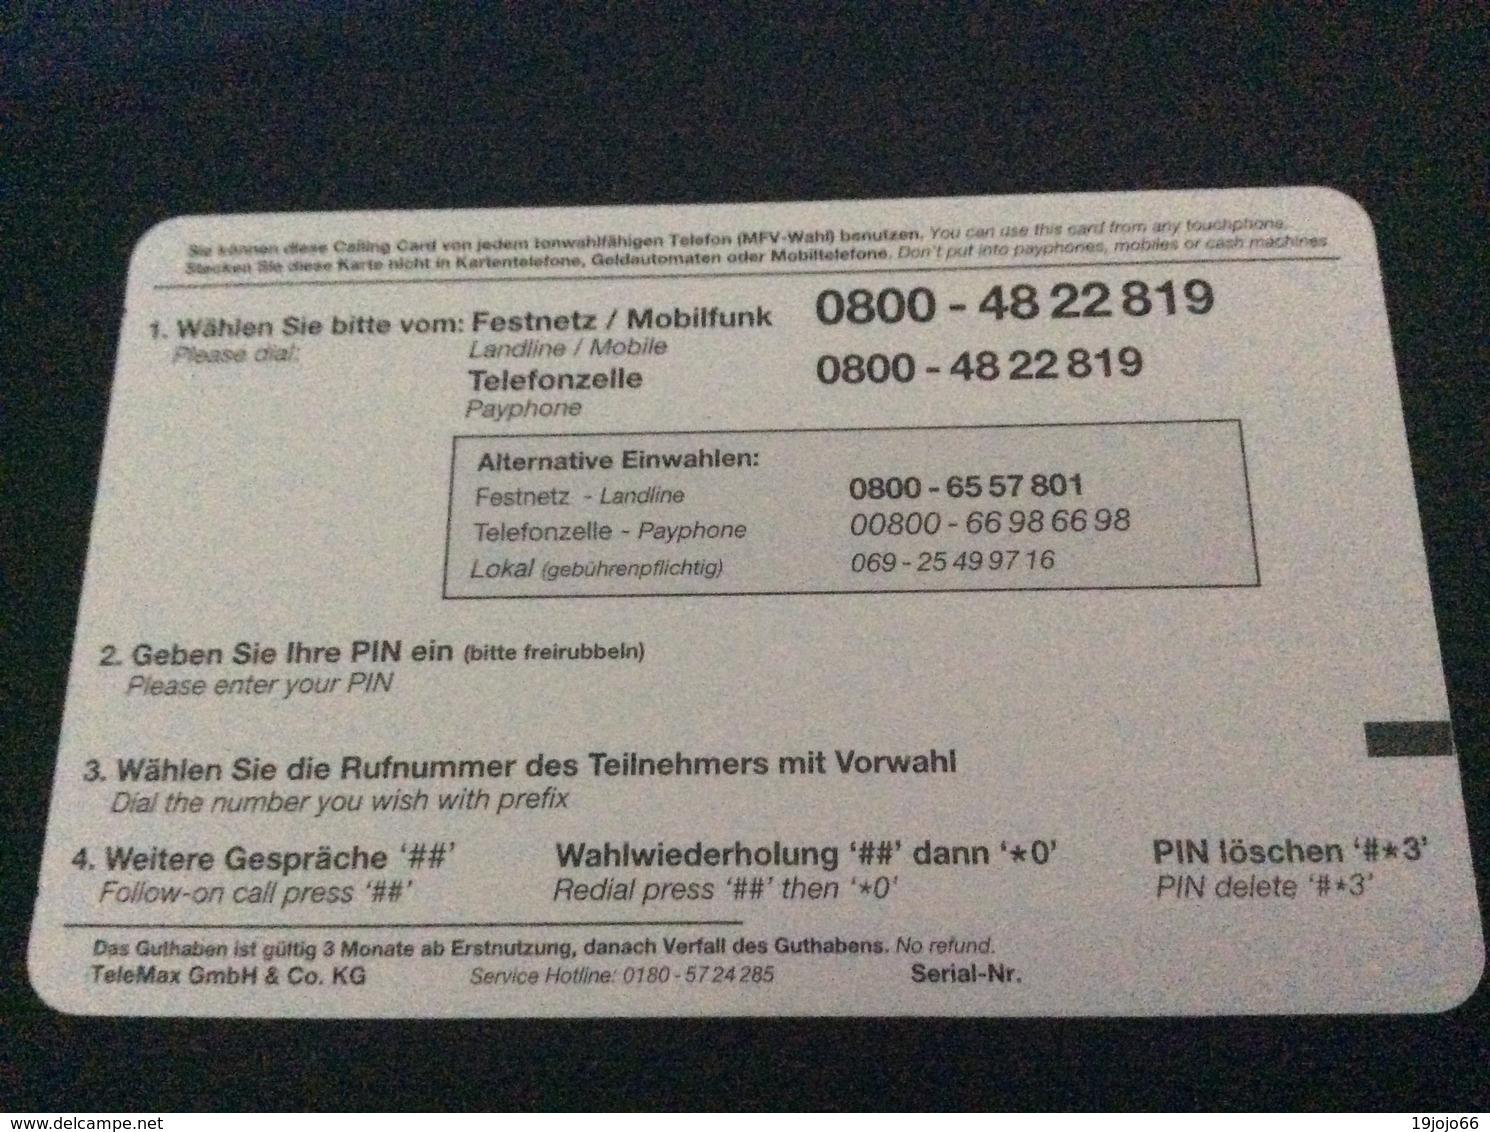 5 Euro Brandenburger Tor - Go Cash Europe -   -  Little Printed  -   Used Condition - [2] Prepaid